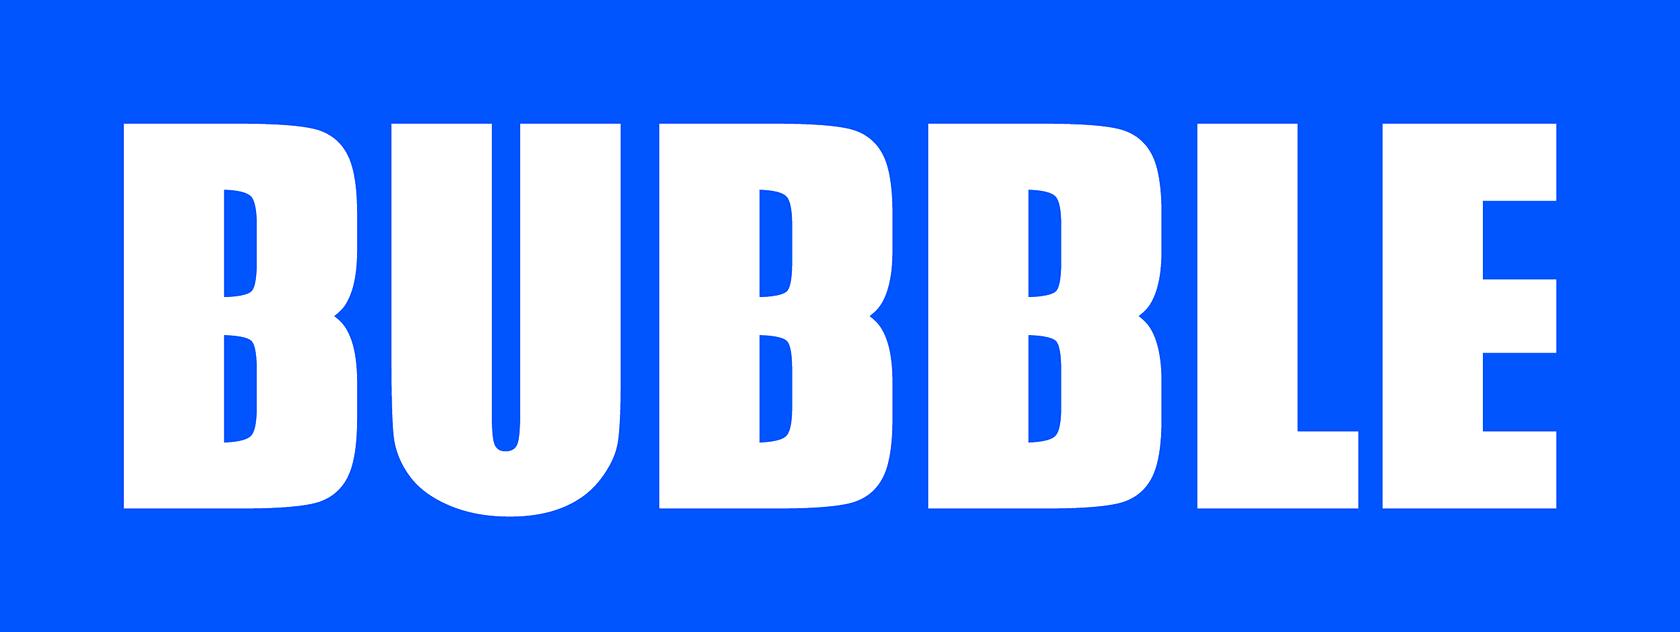 BUBBLE.RU